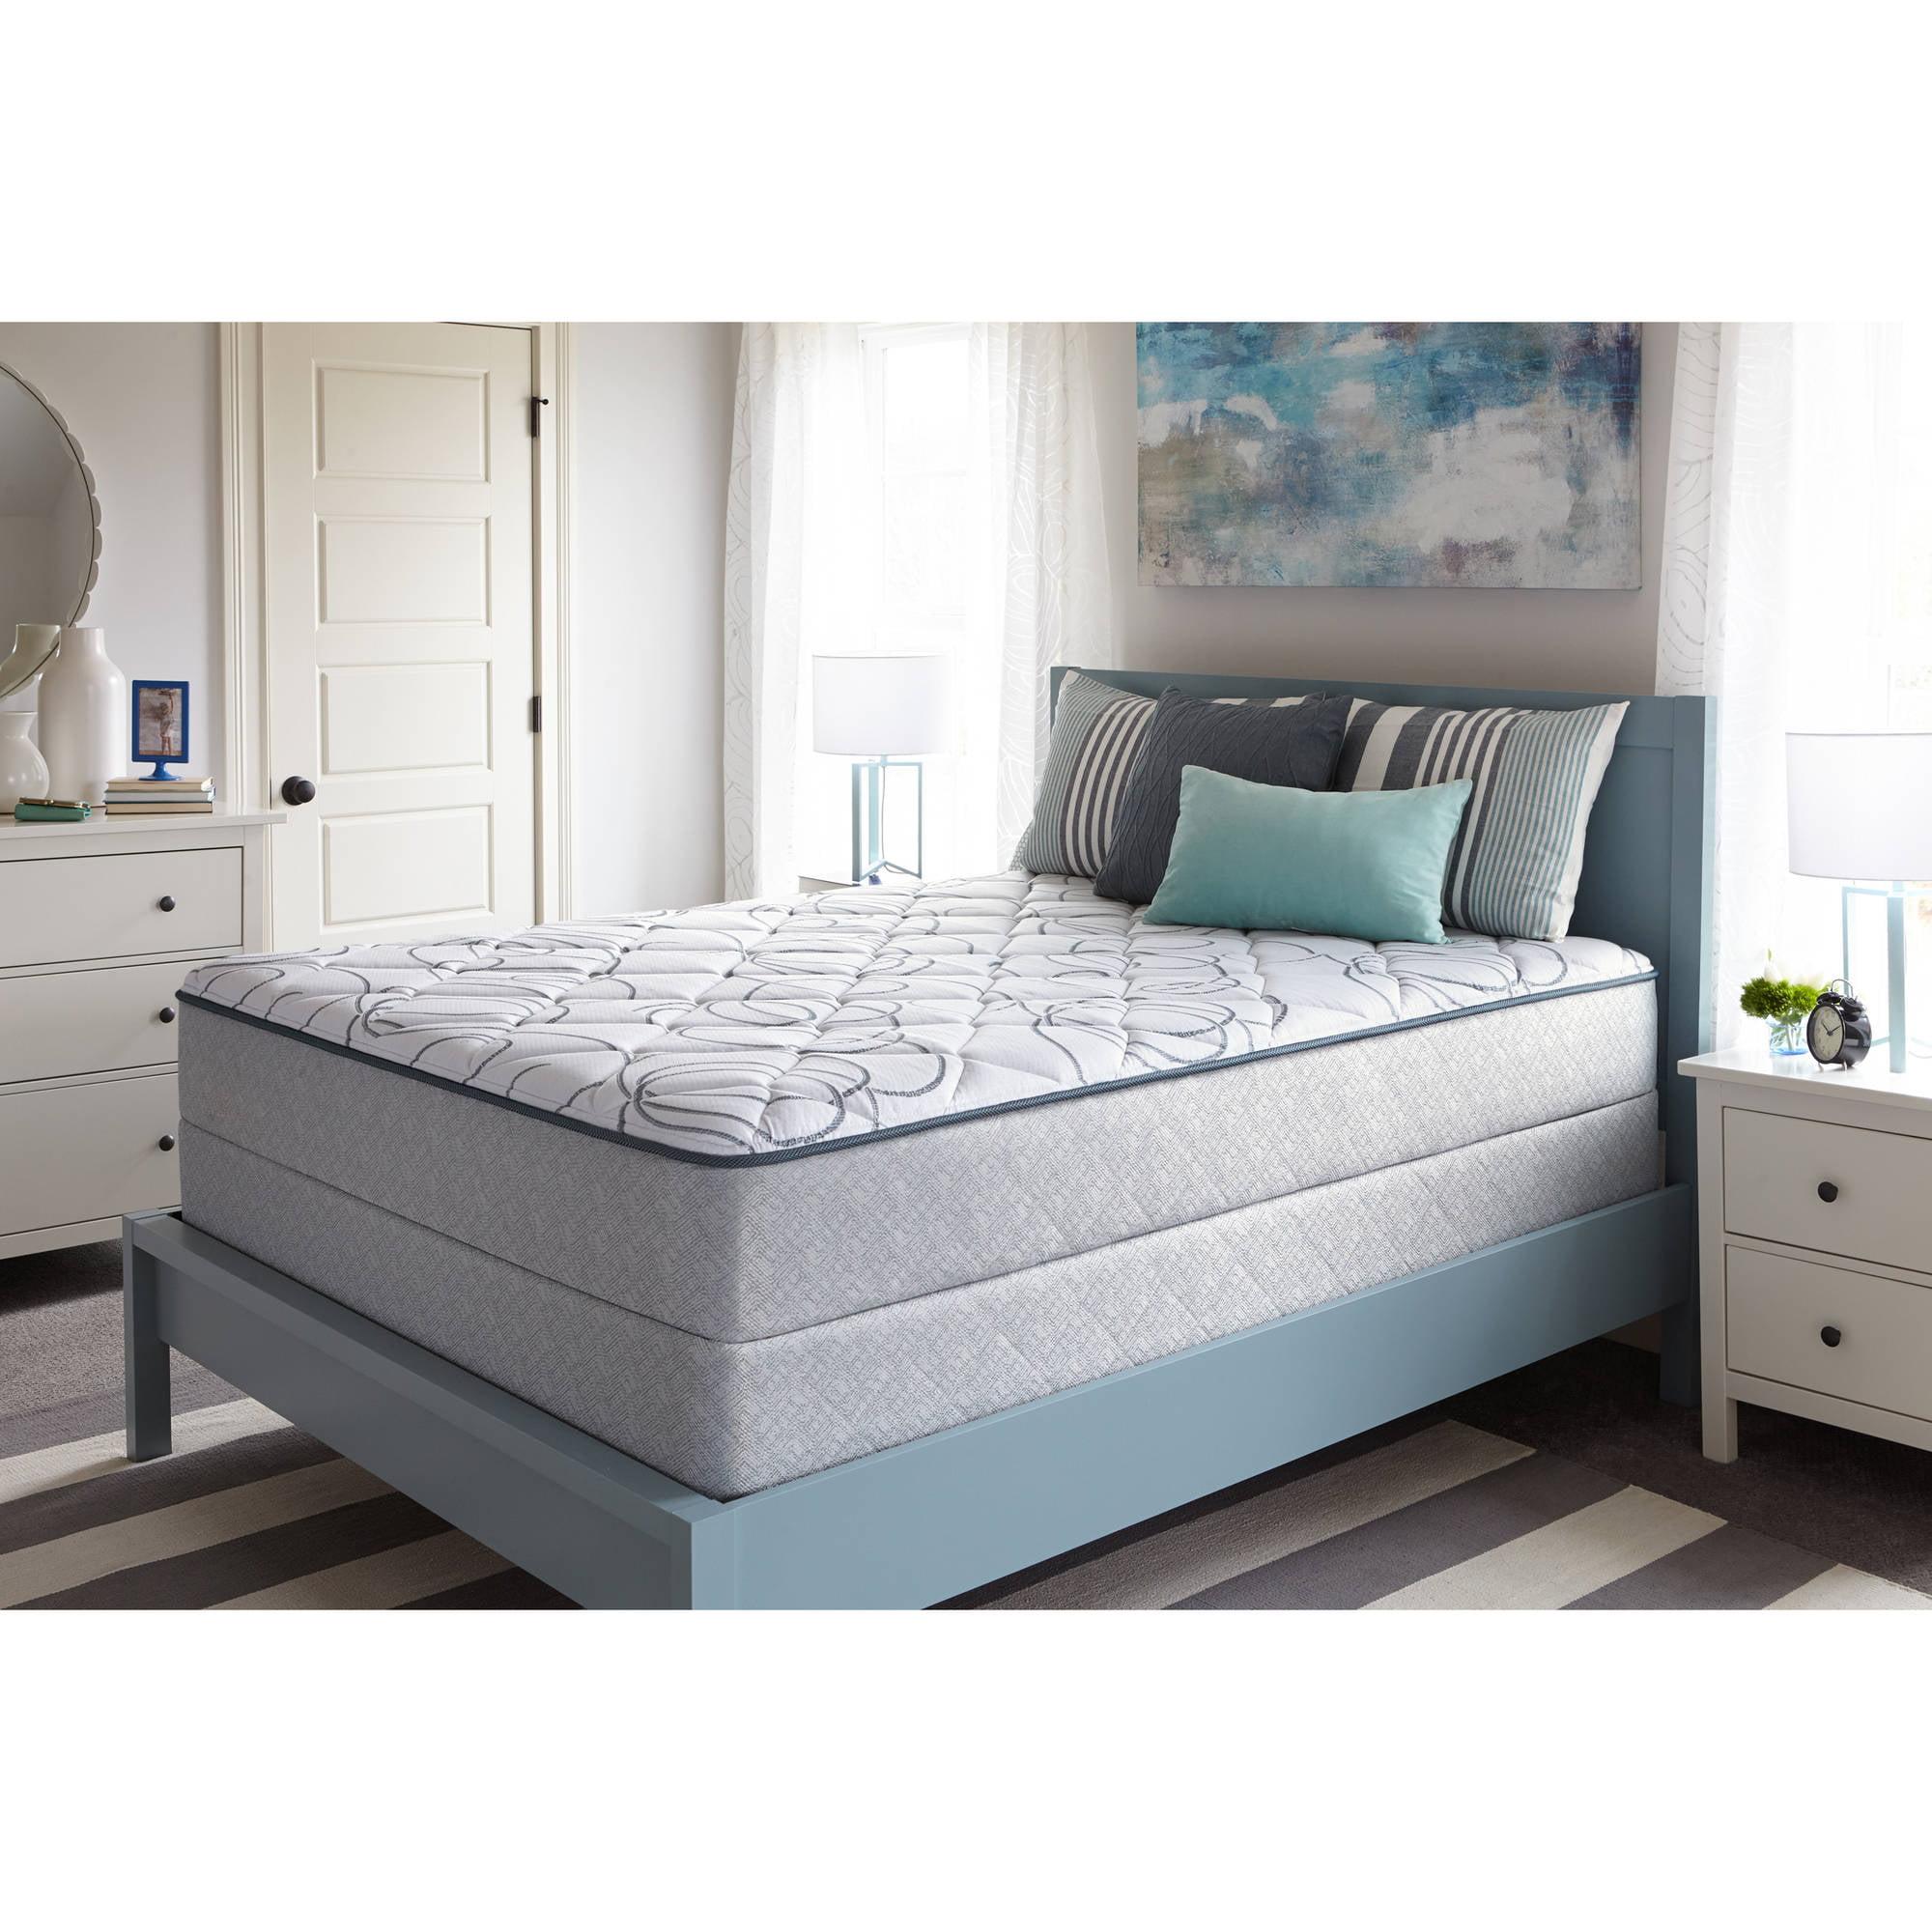 queen mattress box springs. Black Bedroom Furniture Sets. Home Design Ideas